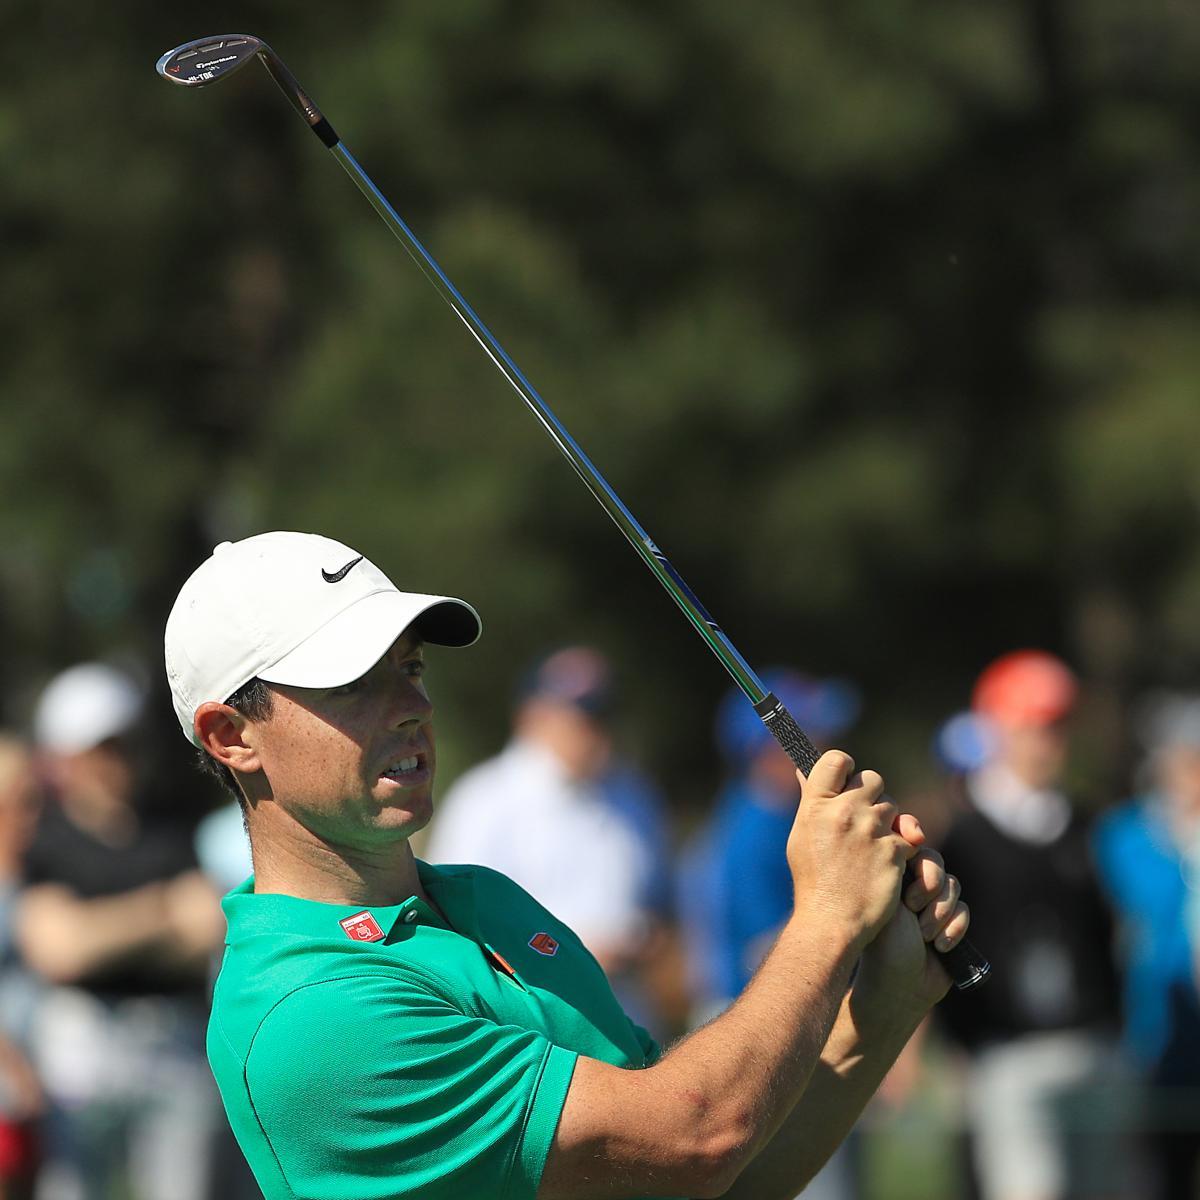 Latest masters golf betting hi mom send bitcoins